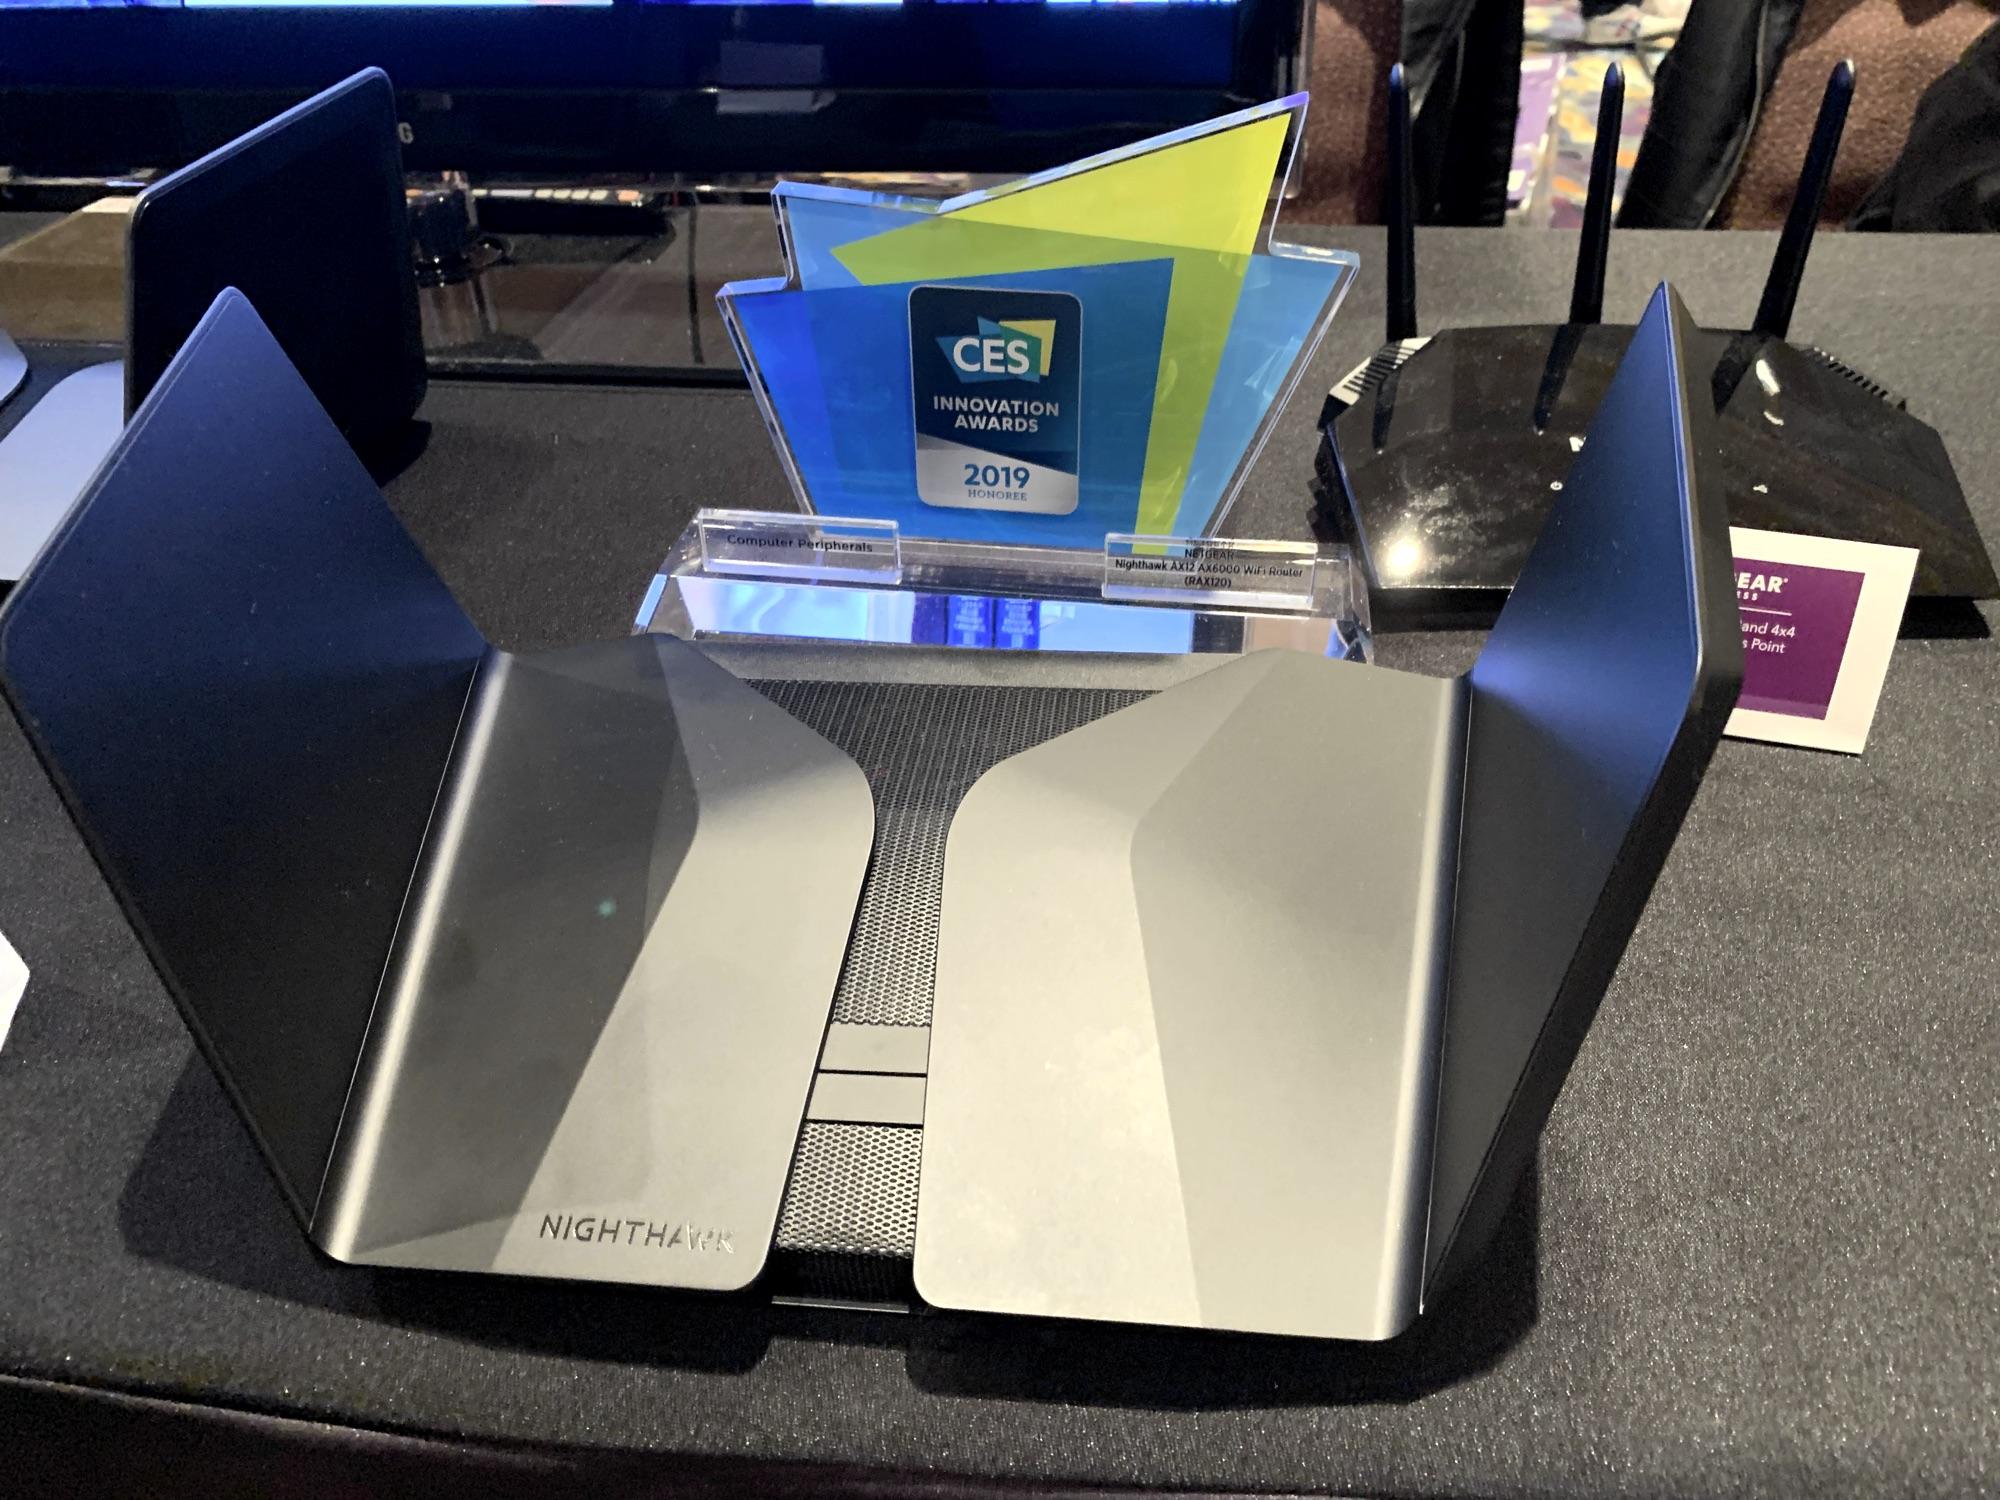 CES – Netgear's Nighthawk AX12 Brings Wi-Fi 6 and Enhancements to Wi-Fi 5